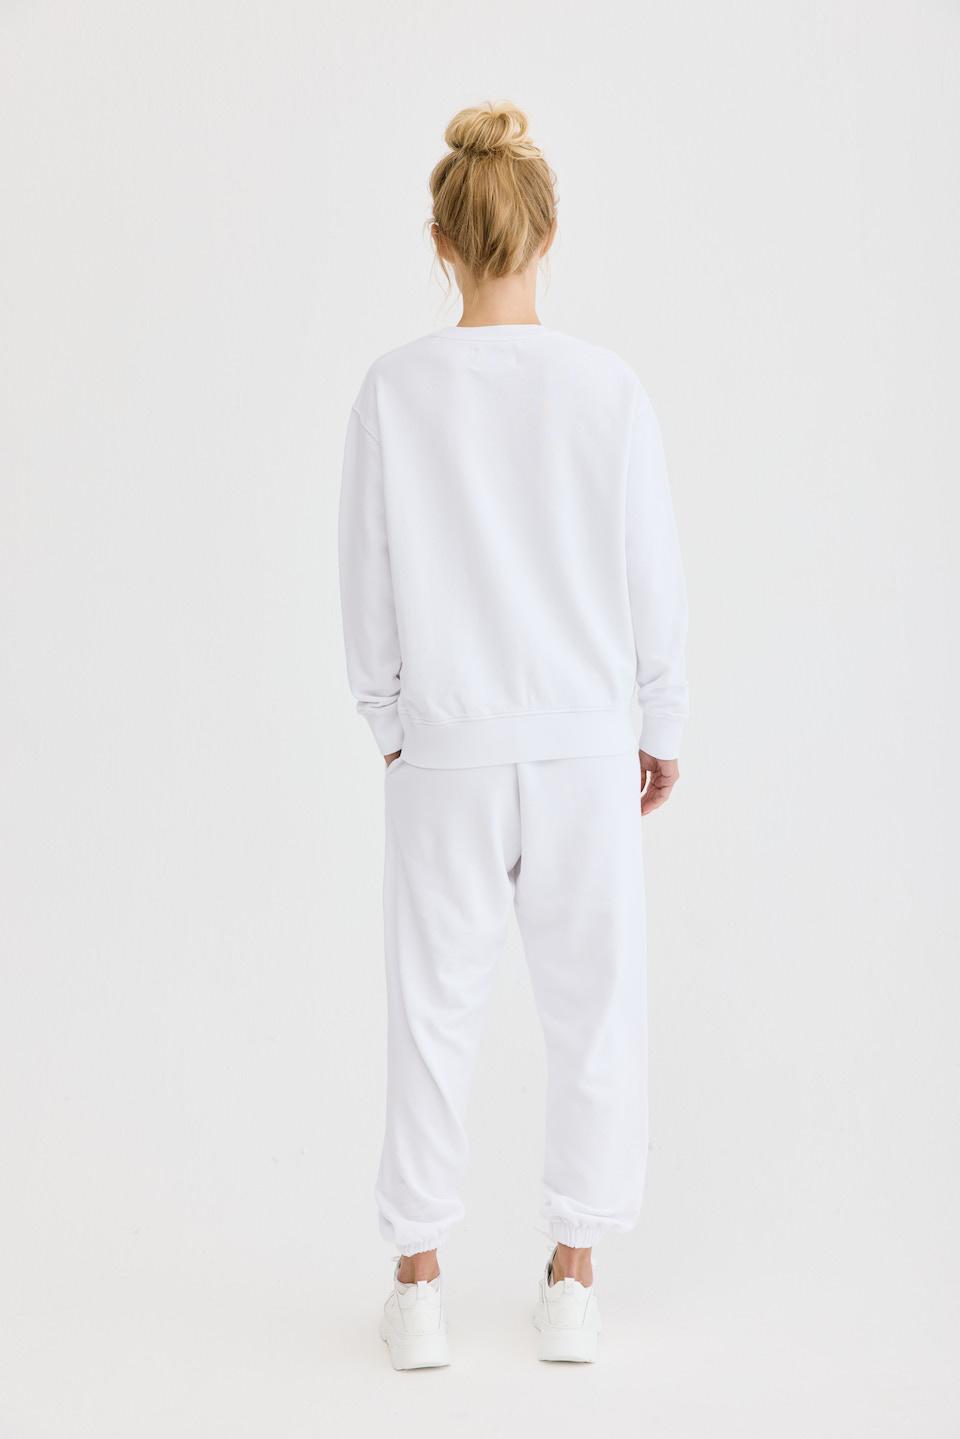 CPH Sweat 5 org. cotton white - alternative 1